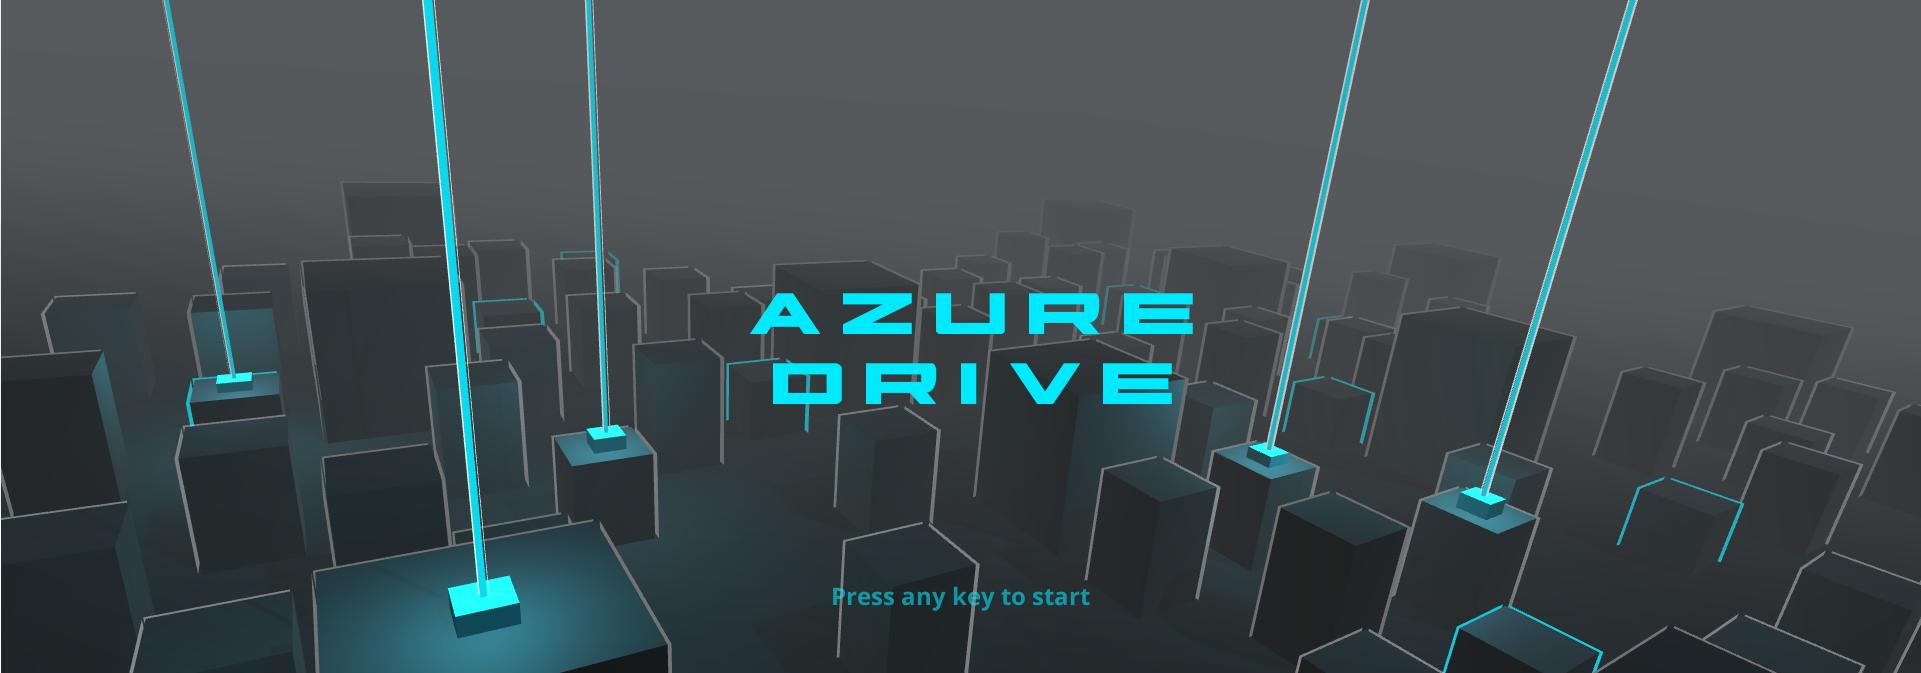 Azure Drive